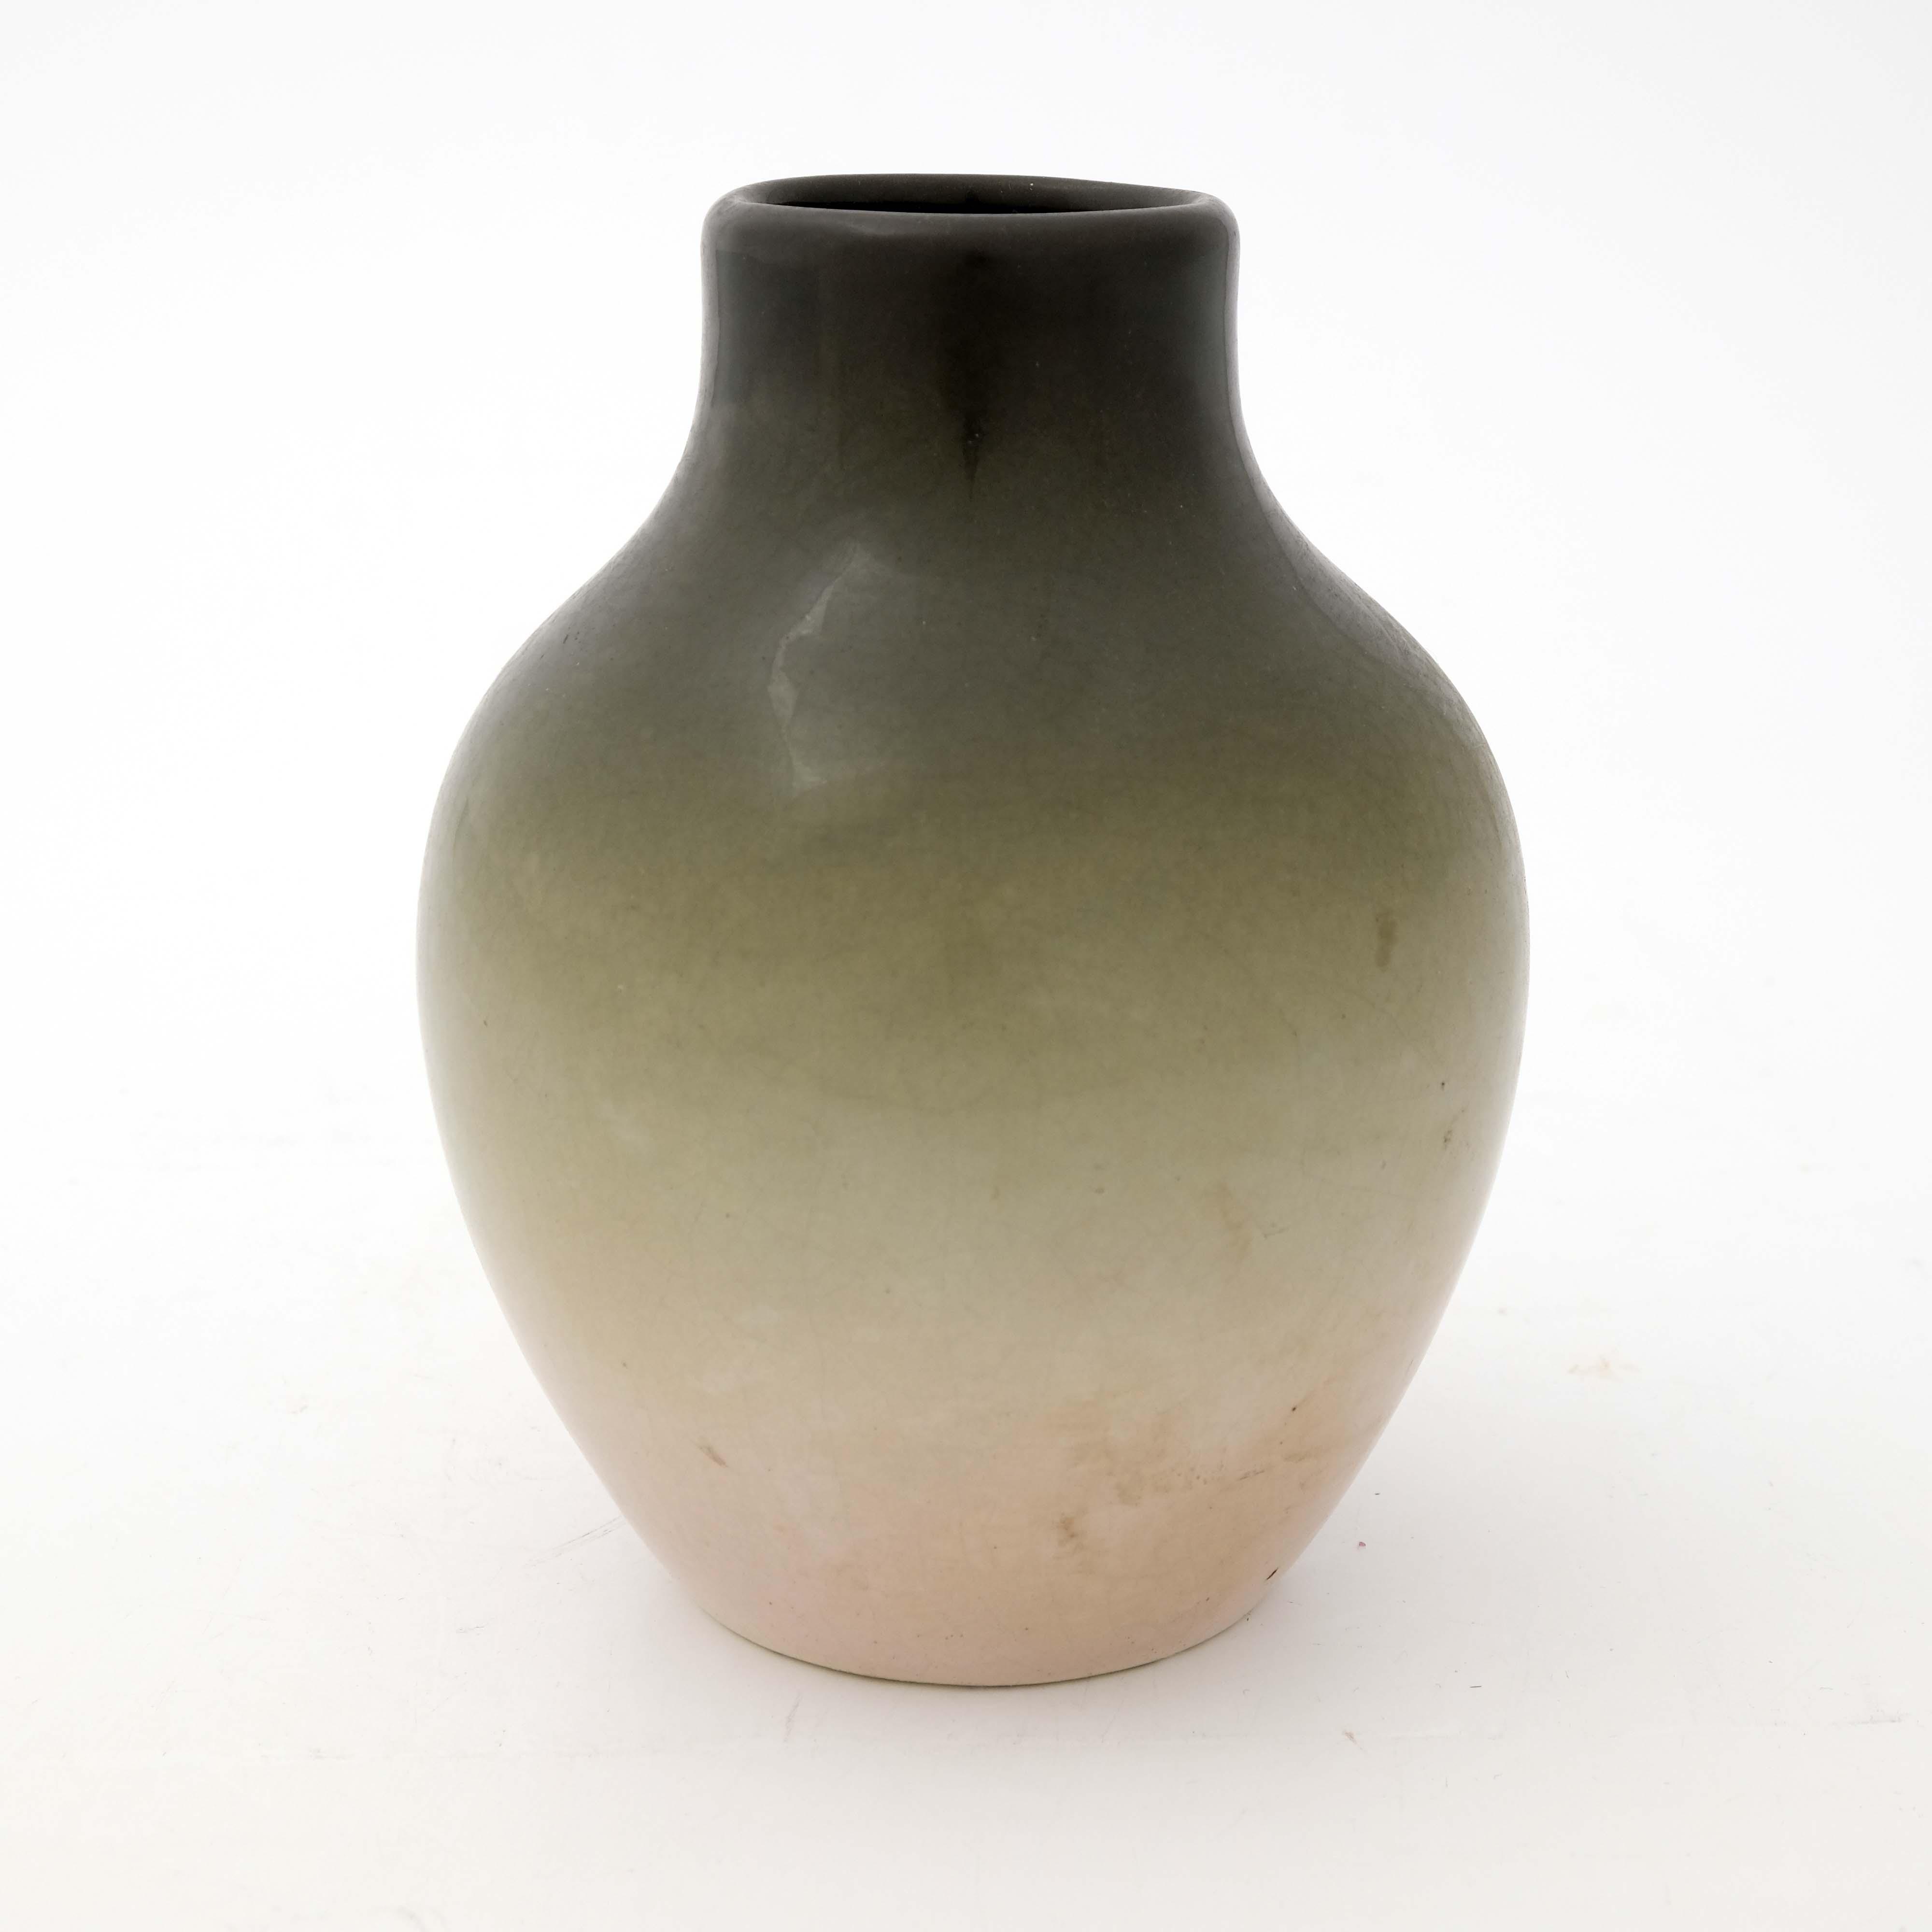 Weller Pottery, an Eocean ware vase - Image 2 of 3